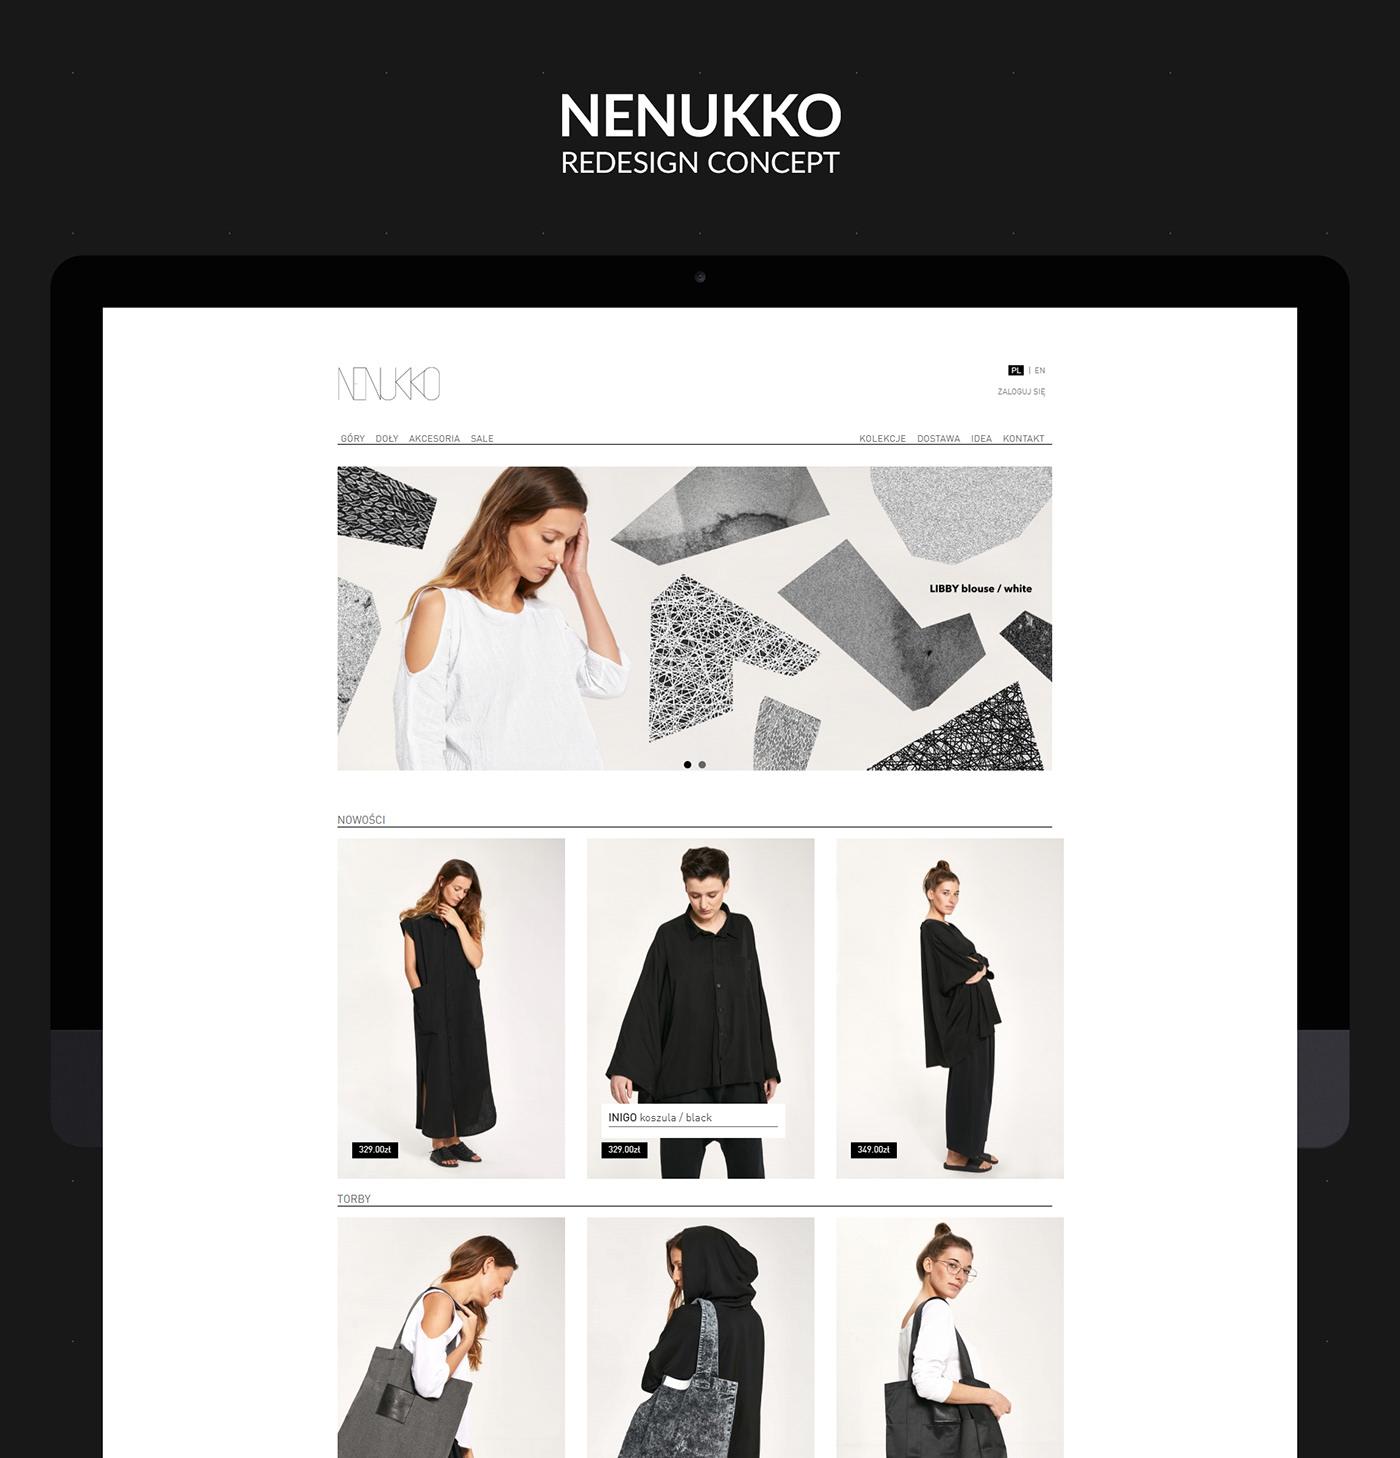 nenukko redesign Webdesign Web design animation  UI concept